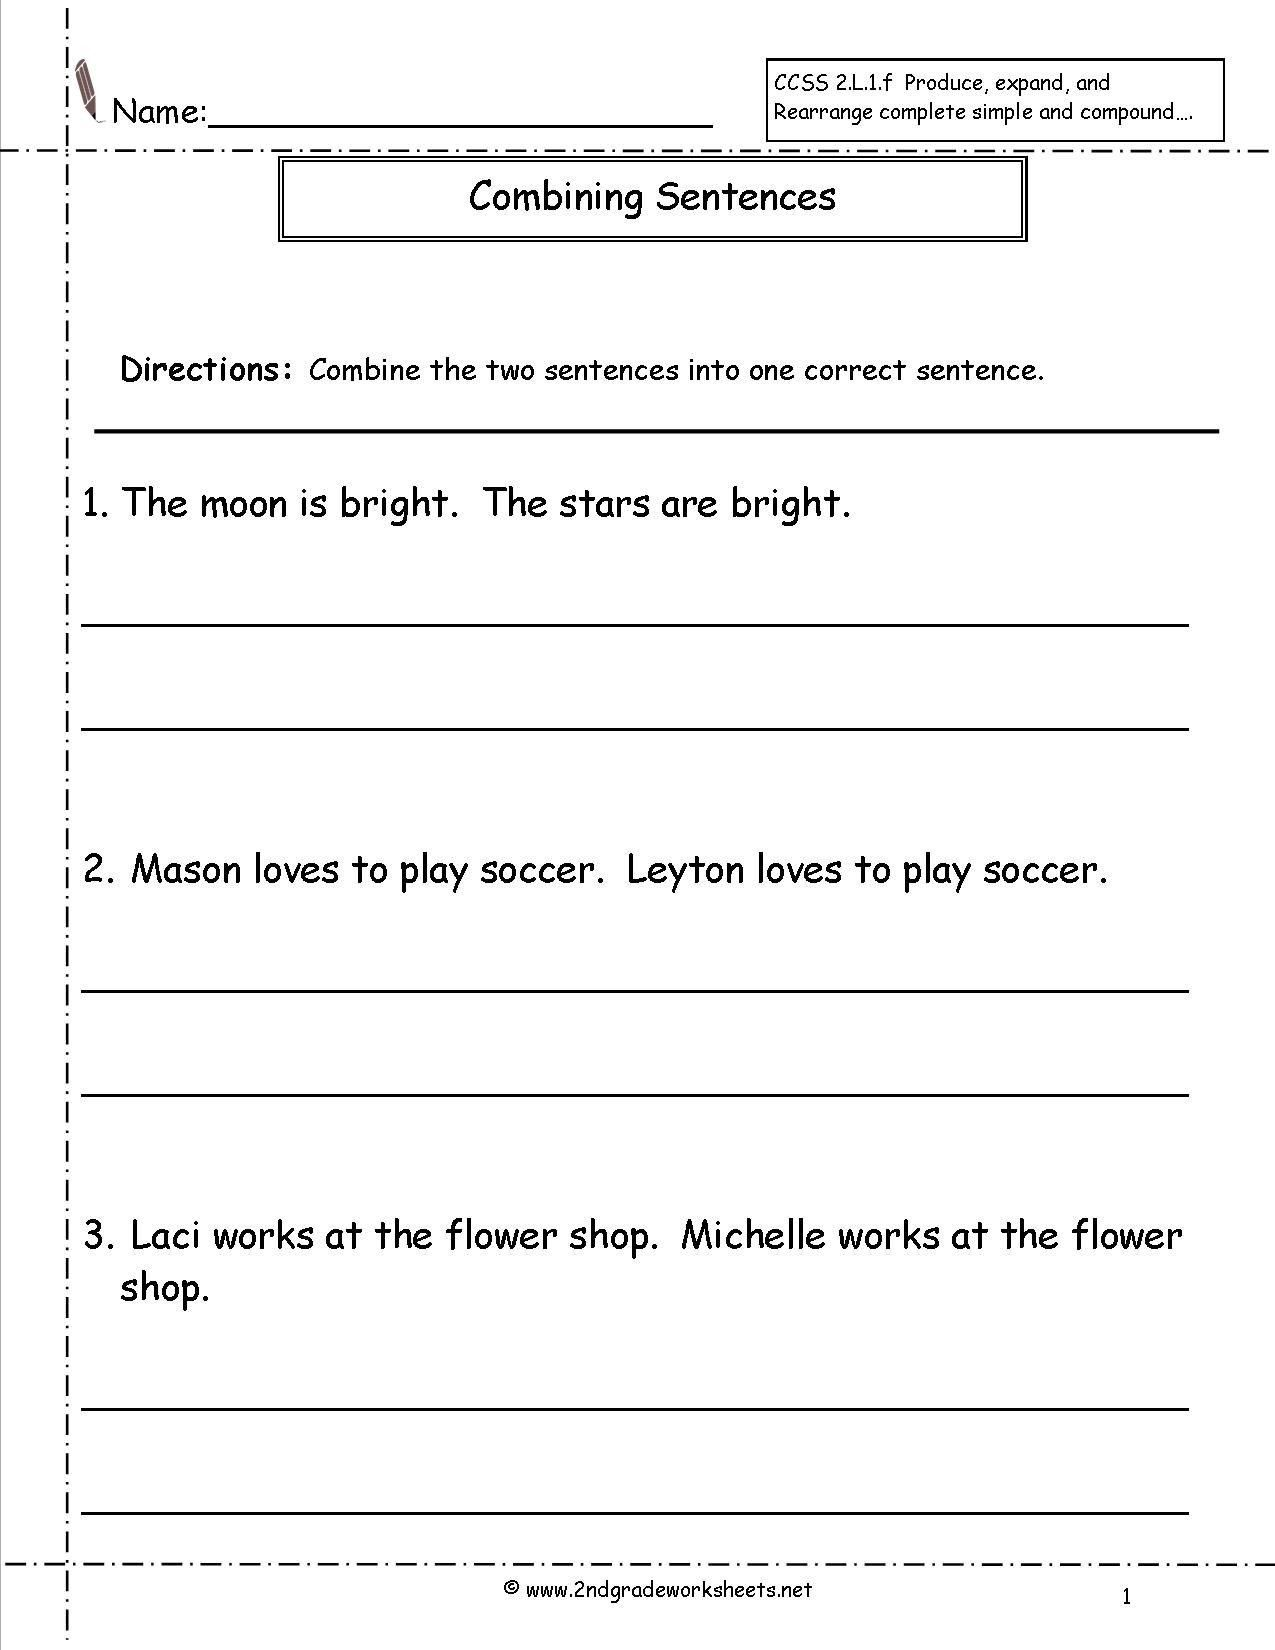 Combining Sentences Worksheets 5th Grade Bining Sentences